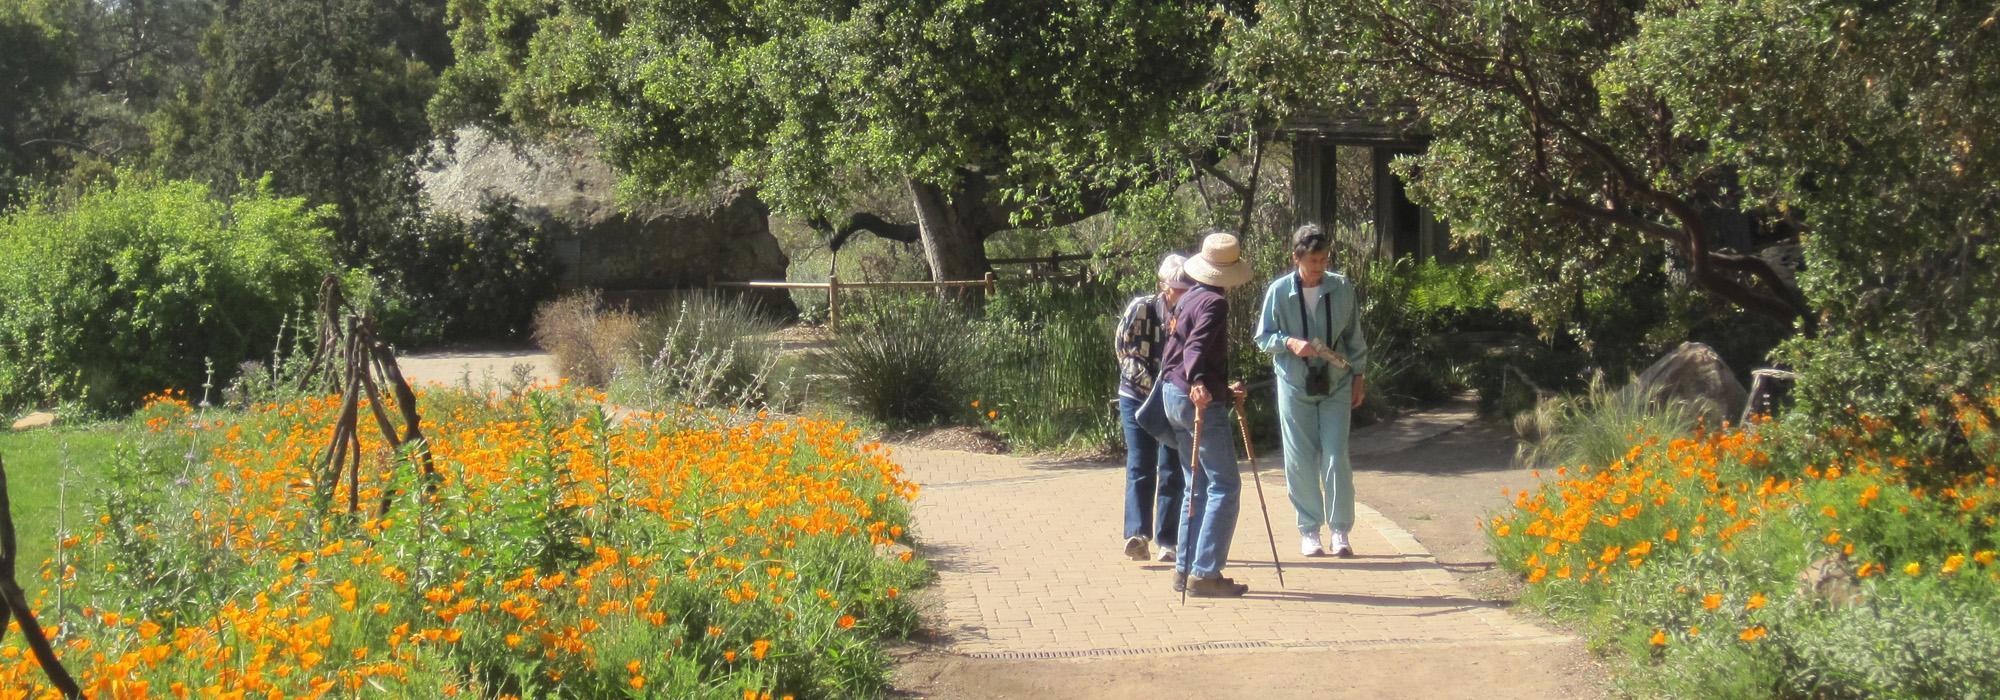 Bon Santa Barbara Botanic Garden.  CA_SantaBarbara_BotanicGarden_hero_03_CharlesBirnbaum_2010